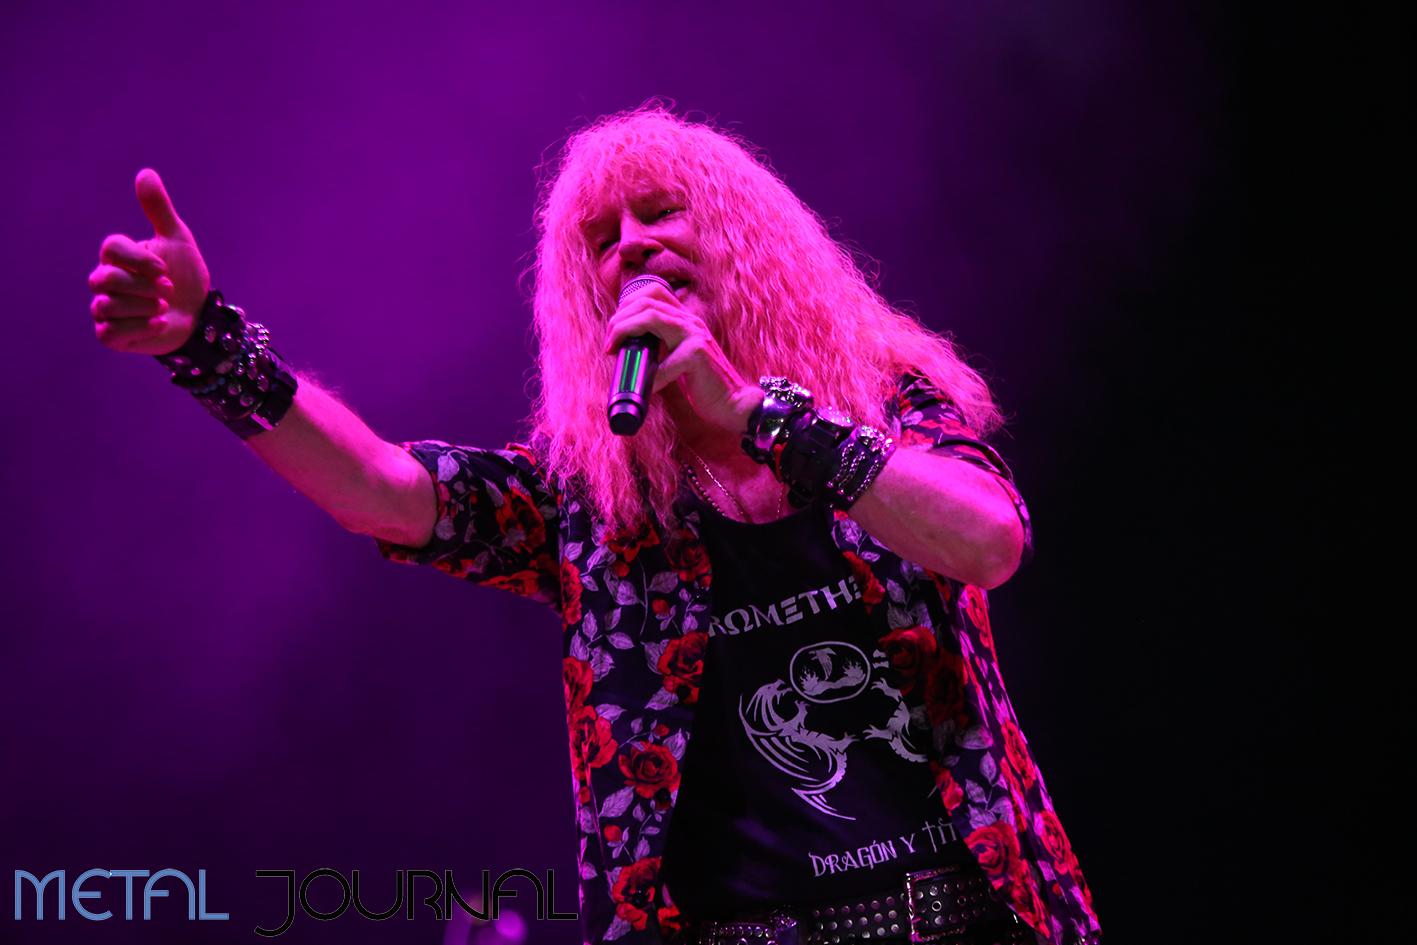 medina azahara - leyendas del rock 2019 metal journal pic 4